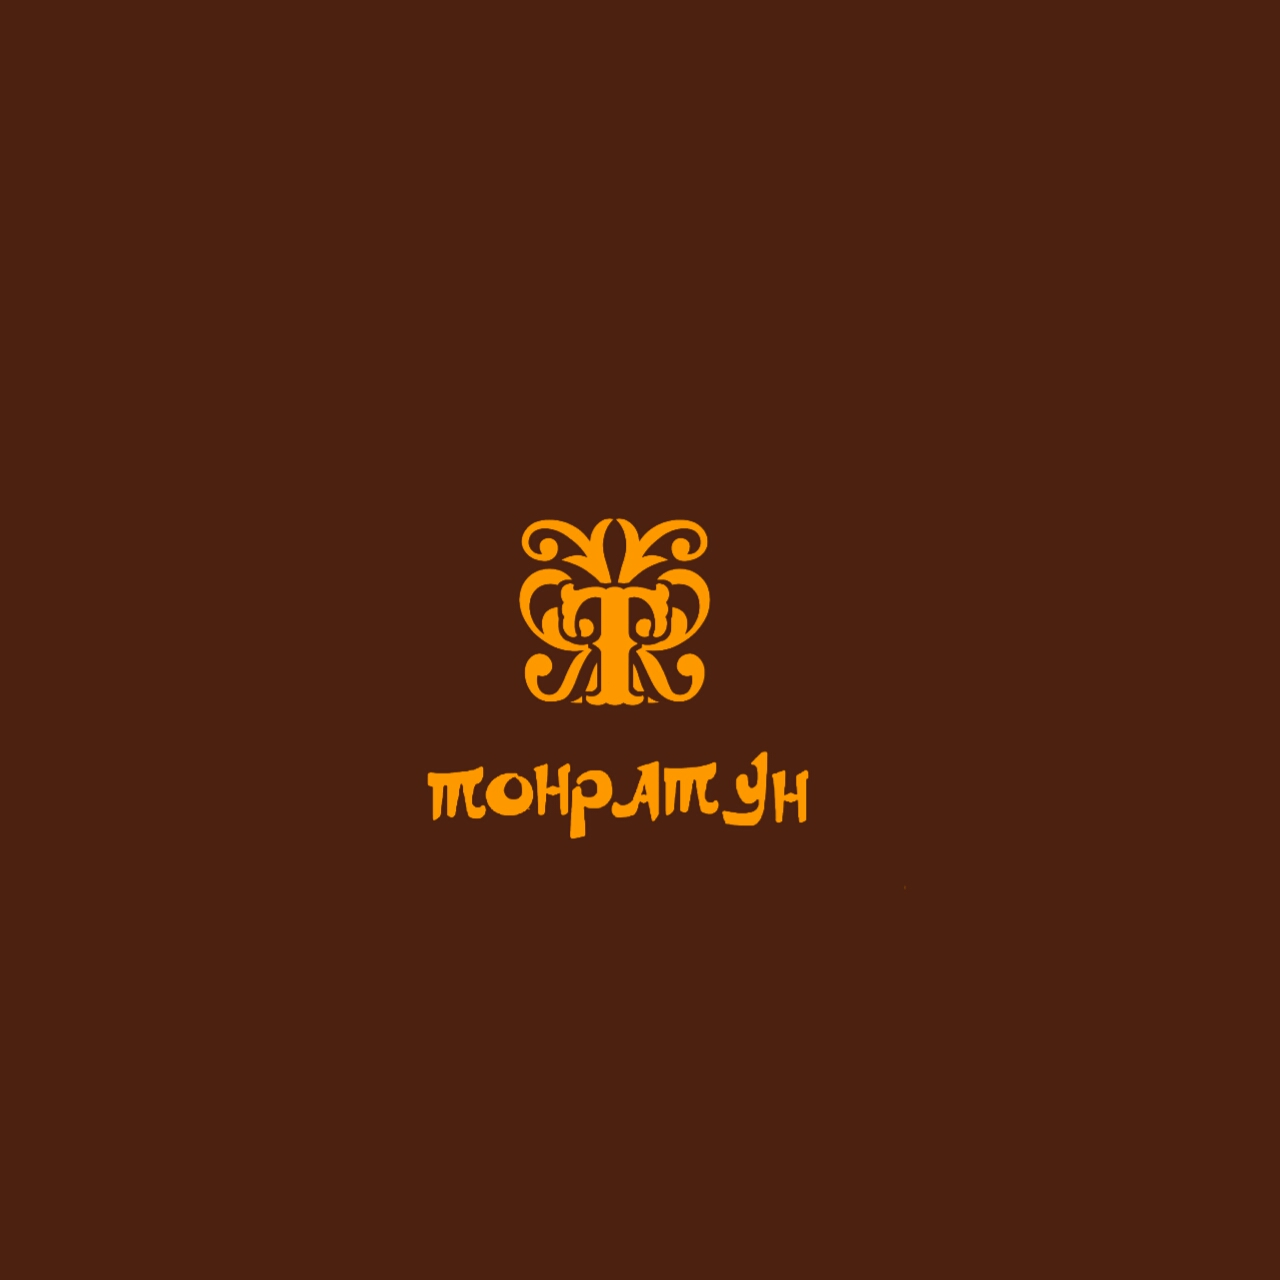 Логотип для Пекарни-Тандырной  фото f_7425d8fa2e87aa8f.jpg